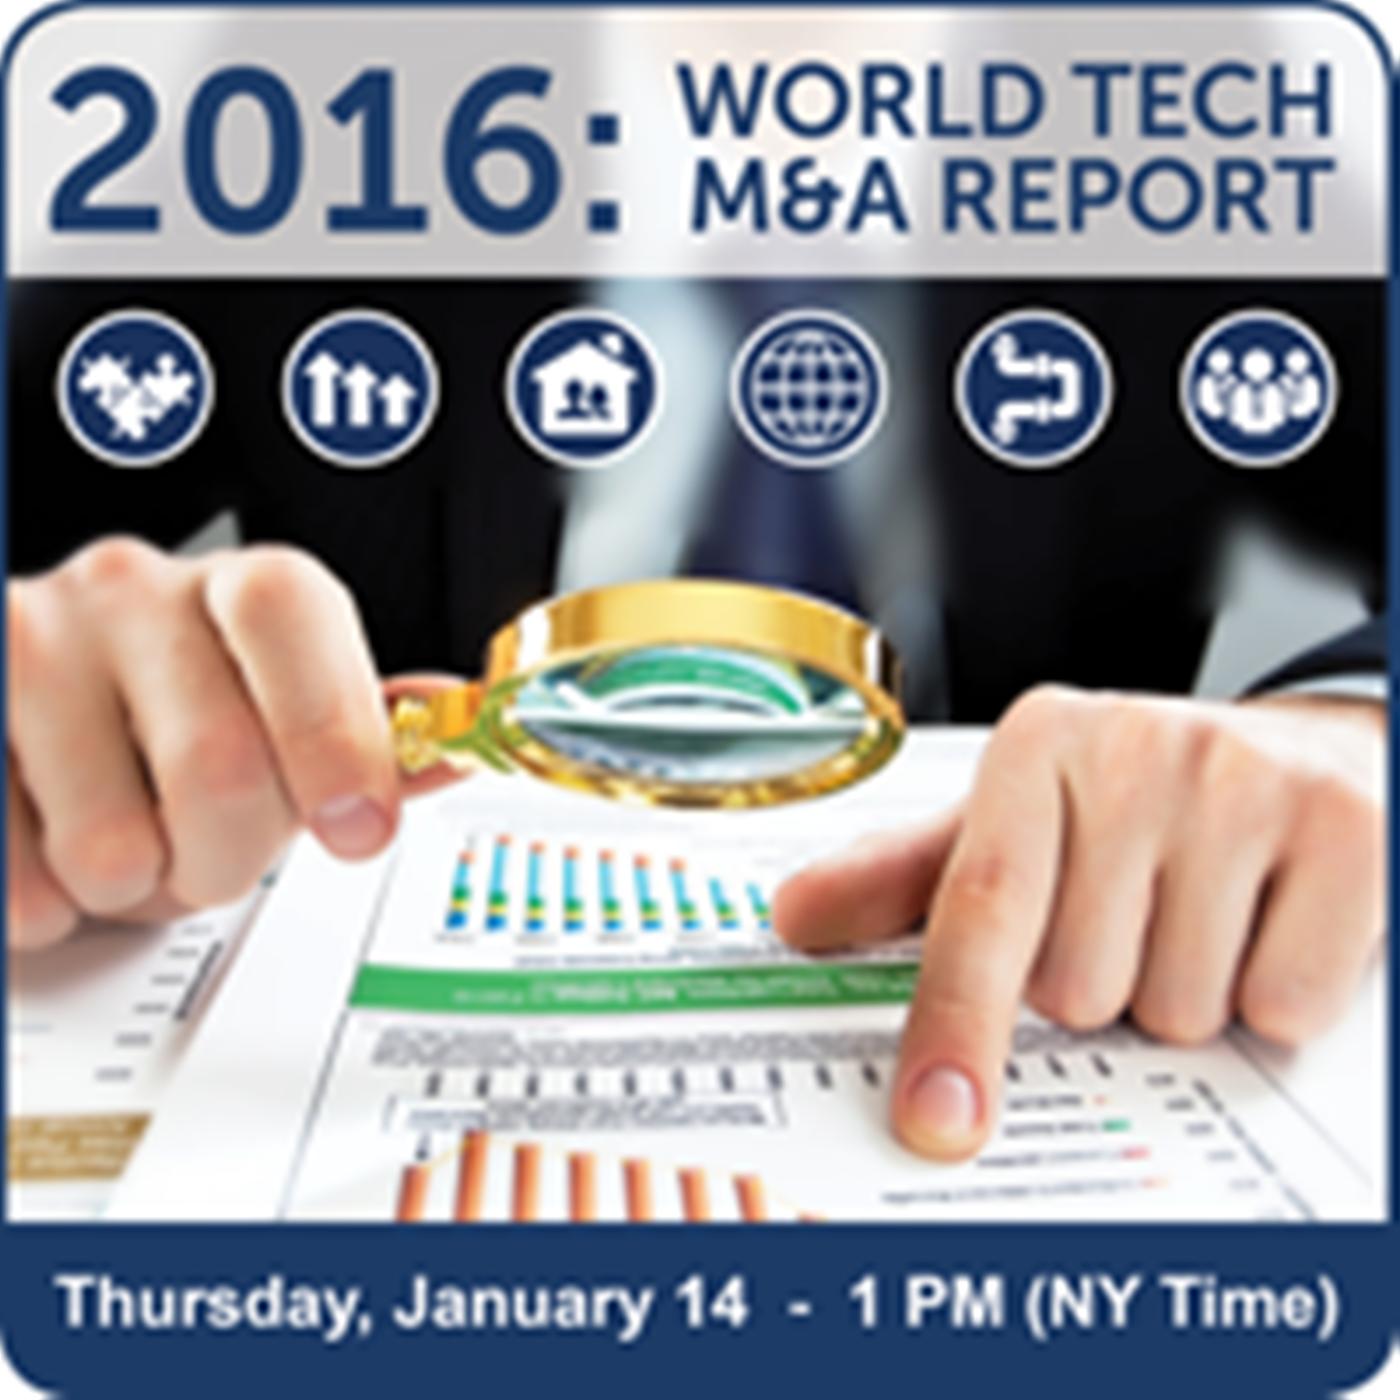 Tech M&A Annual Report: Top 10 Disruptive Tech Trends #7 & 8